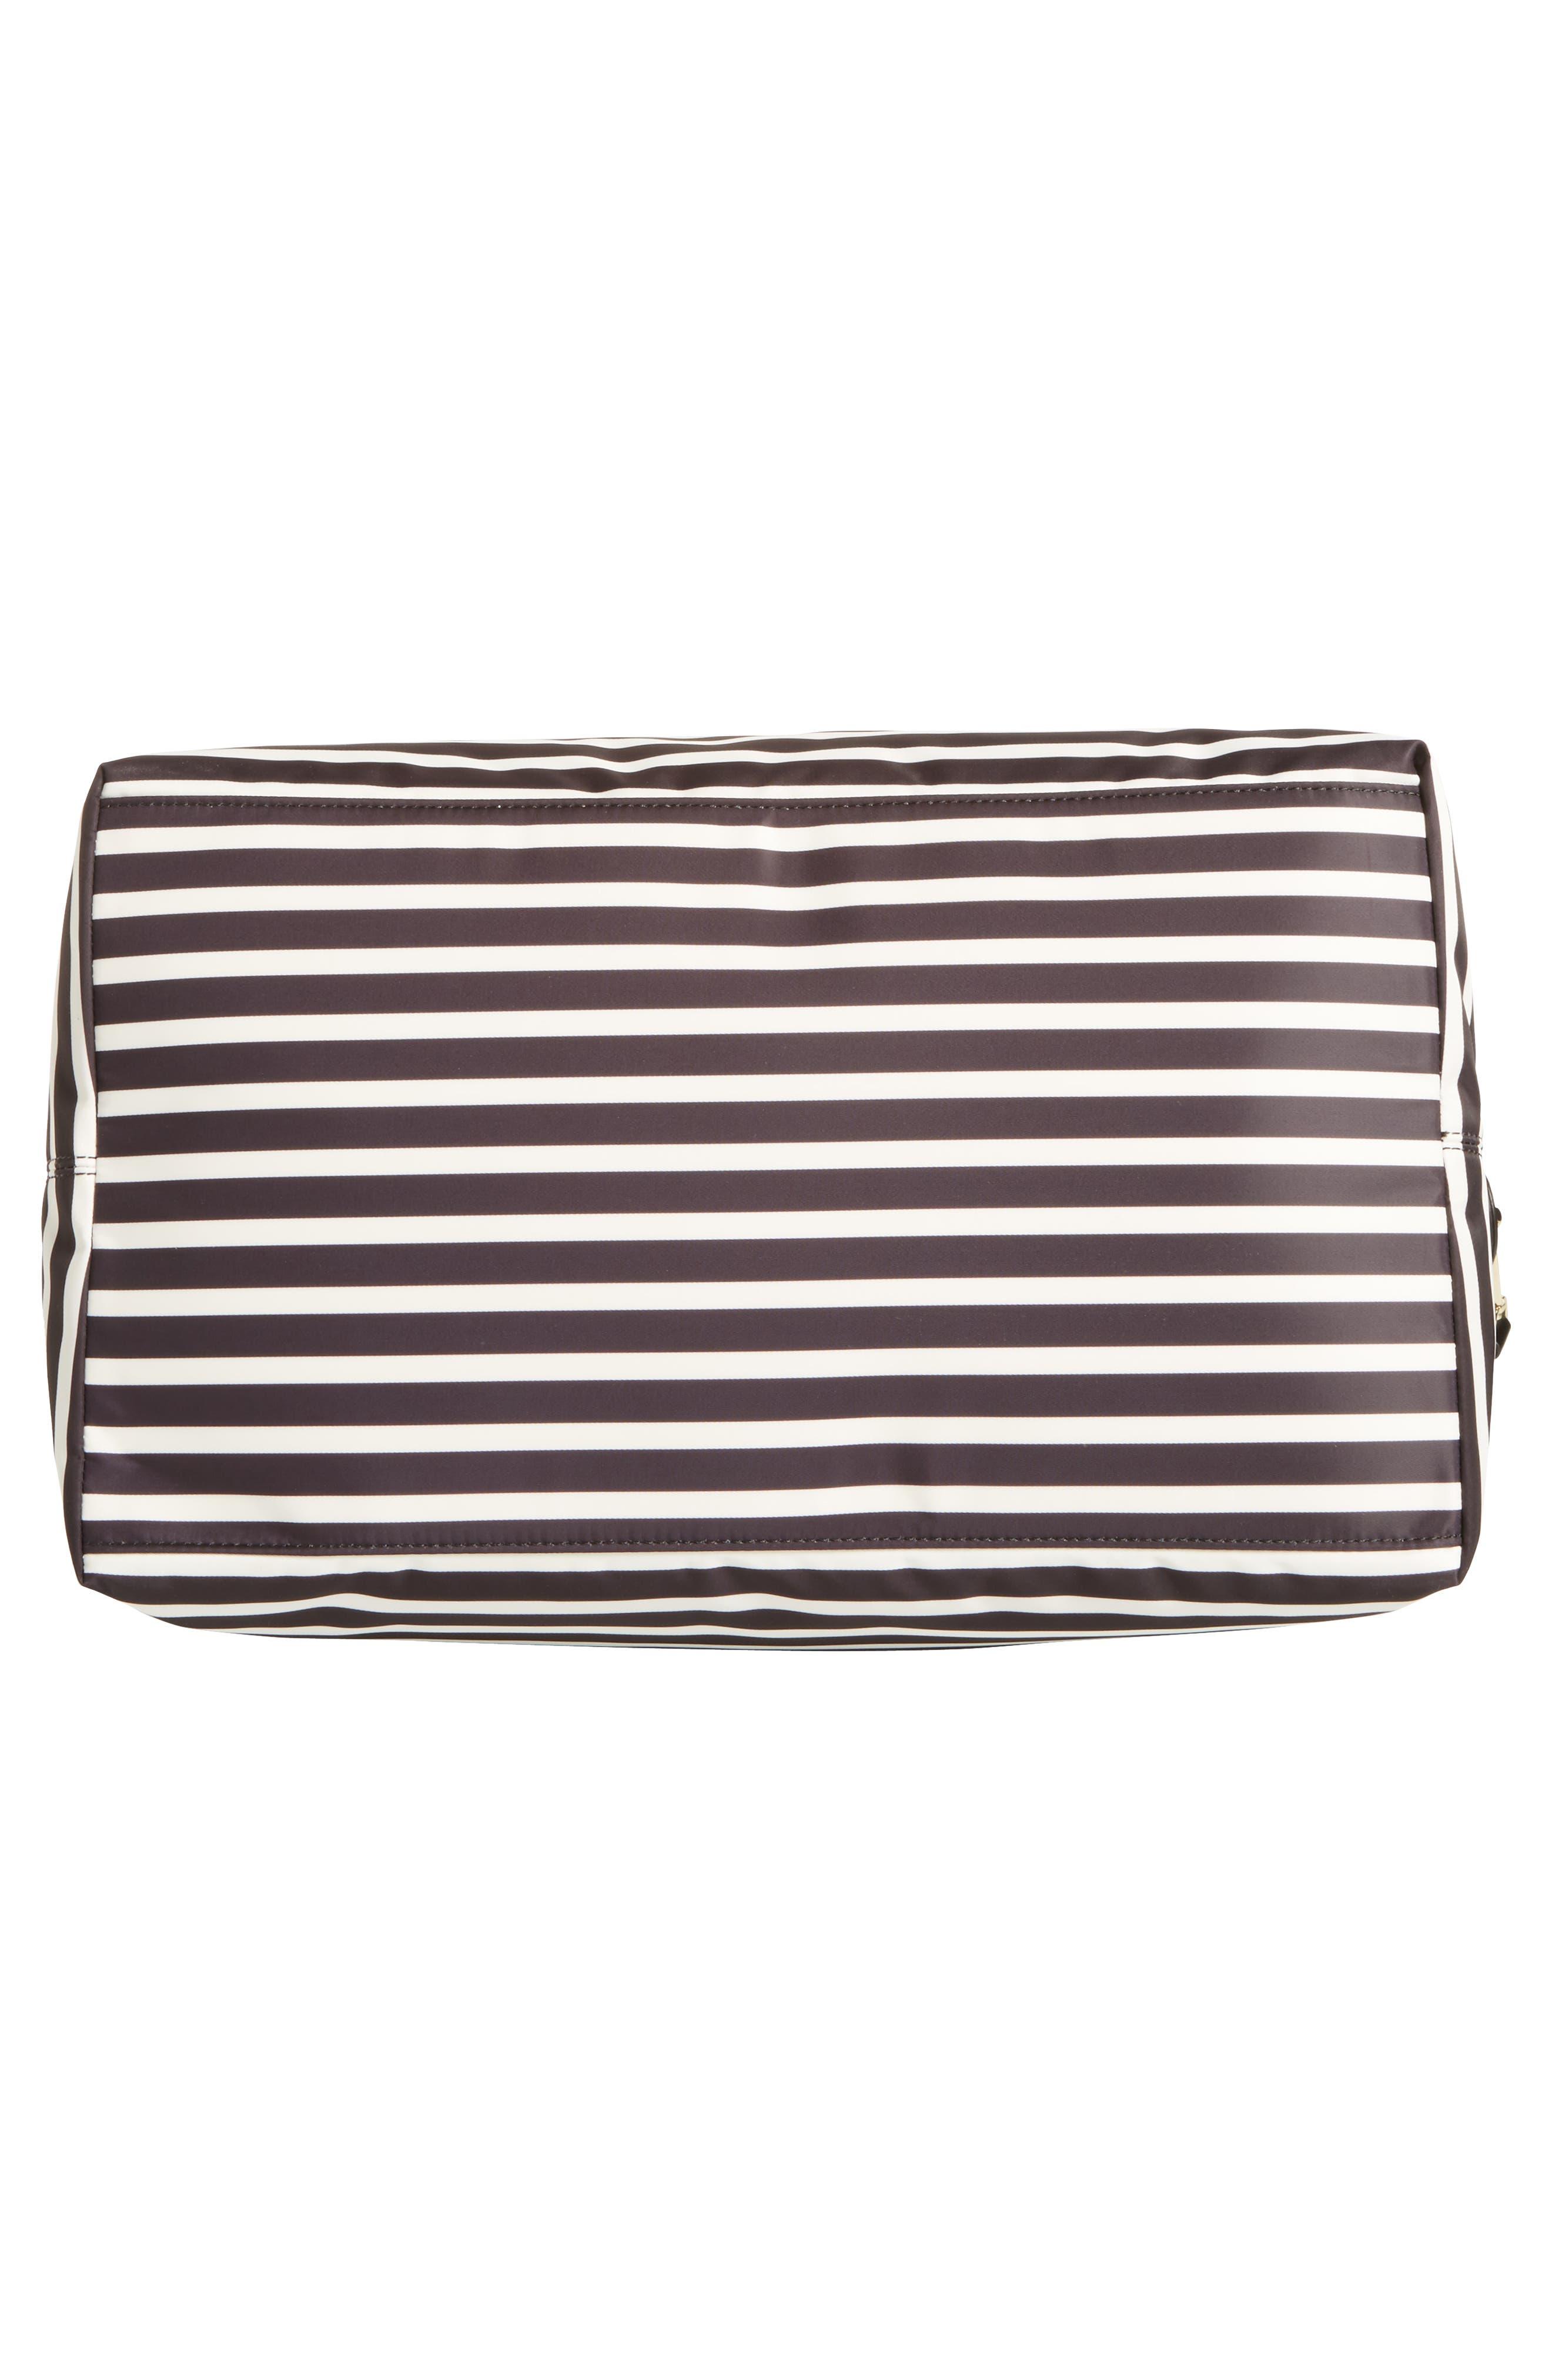 watson lane lyla stripe nylon tote,                             Alternate thumbnail 6, color,                             Black/ Clotted Cream